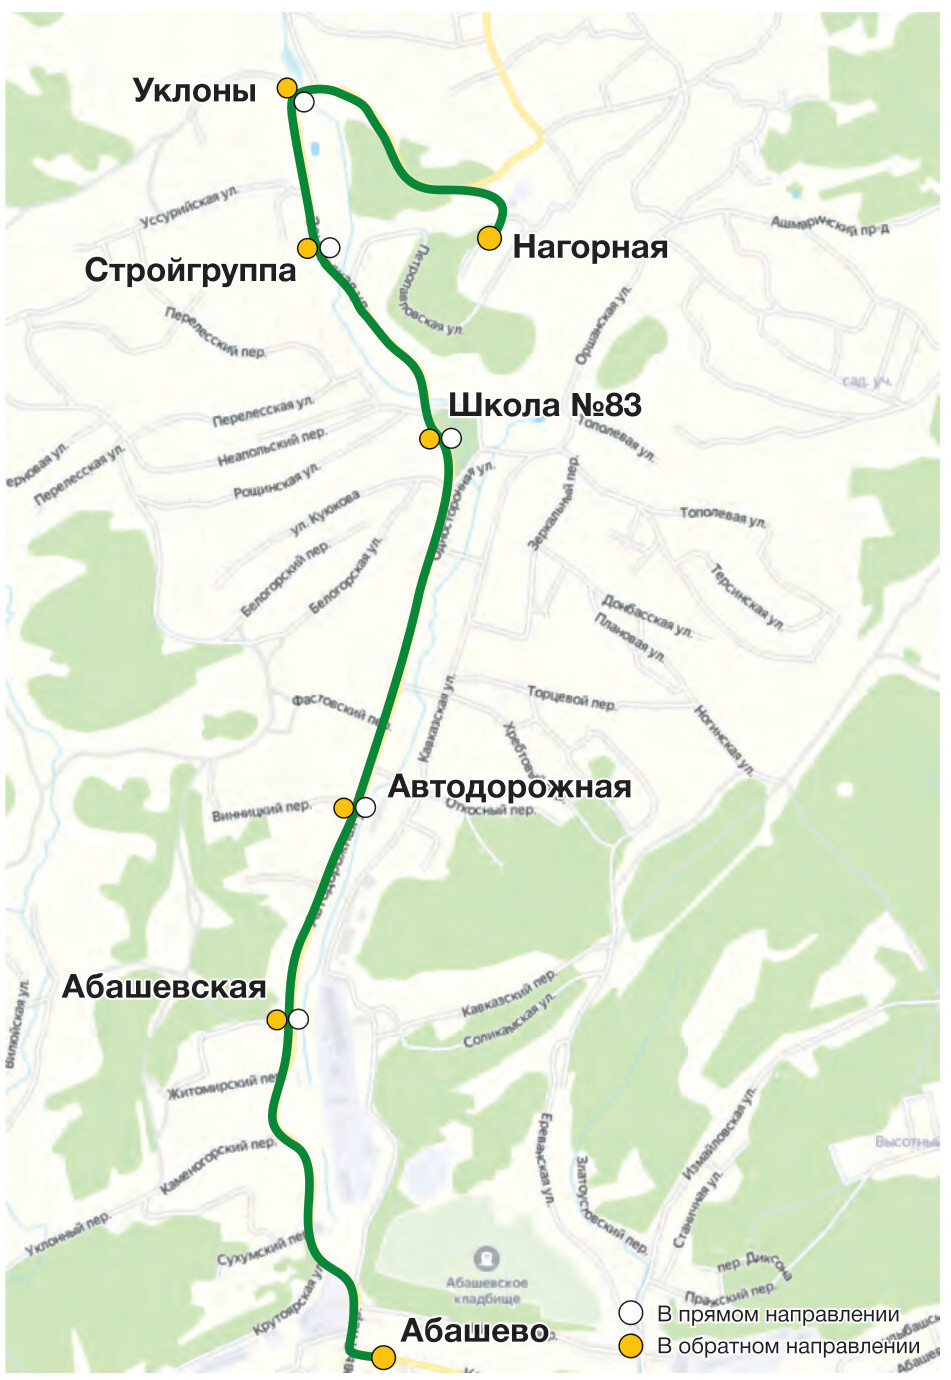 Автобус №2 АБАШЕВО - Ш. НАГОРНАЯ | Карта маршрута